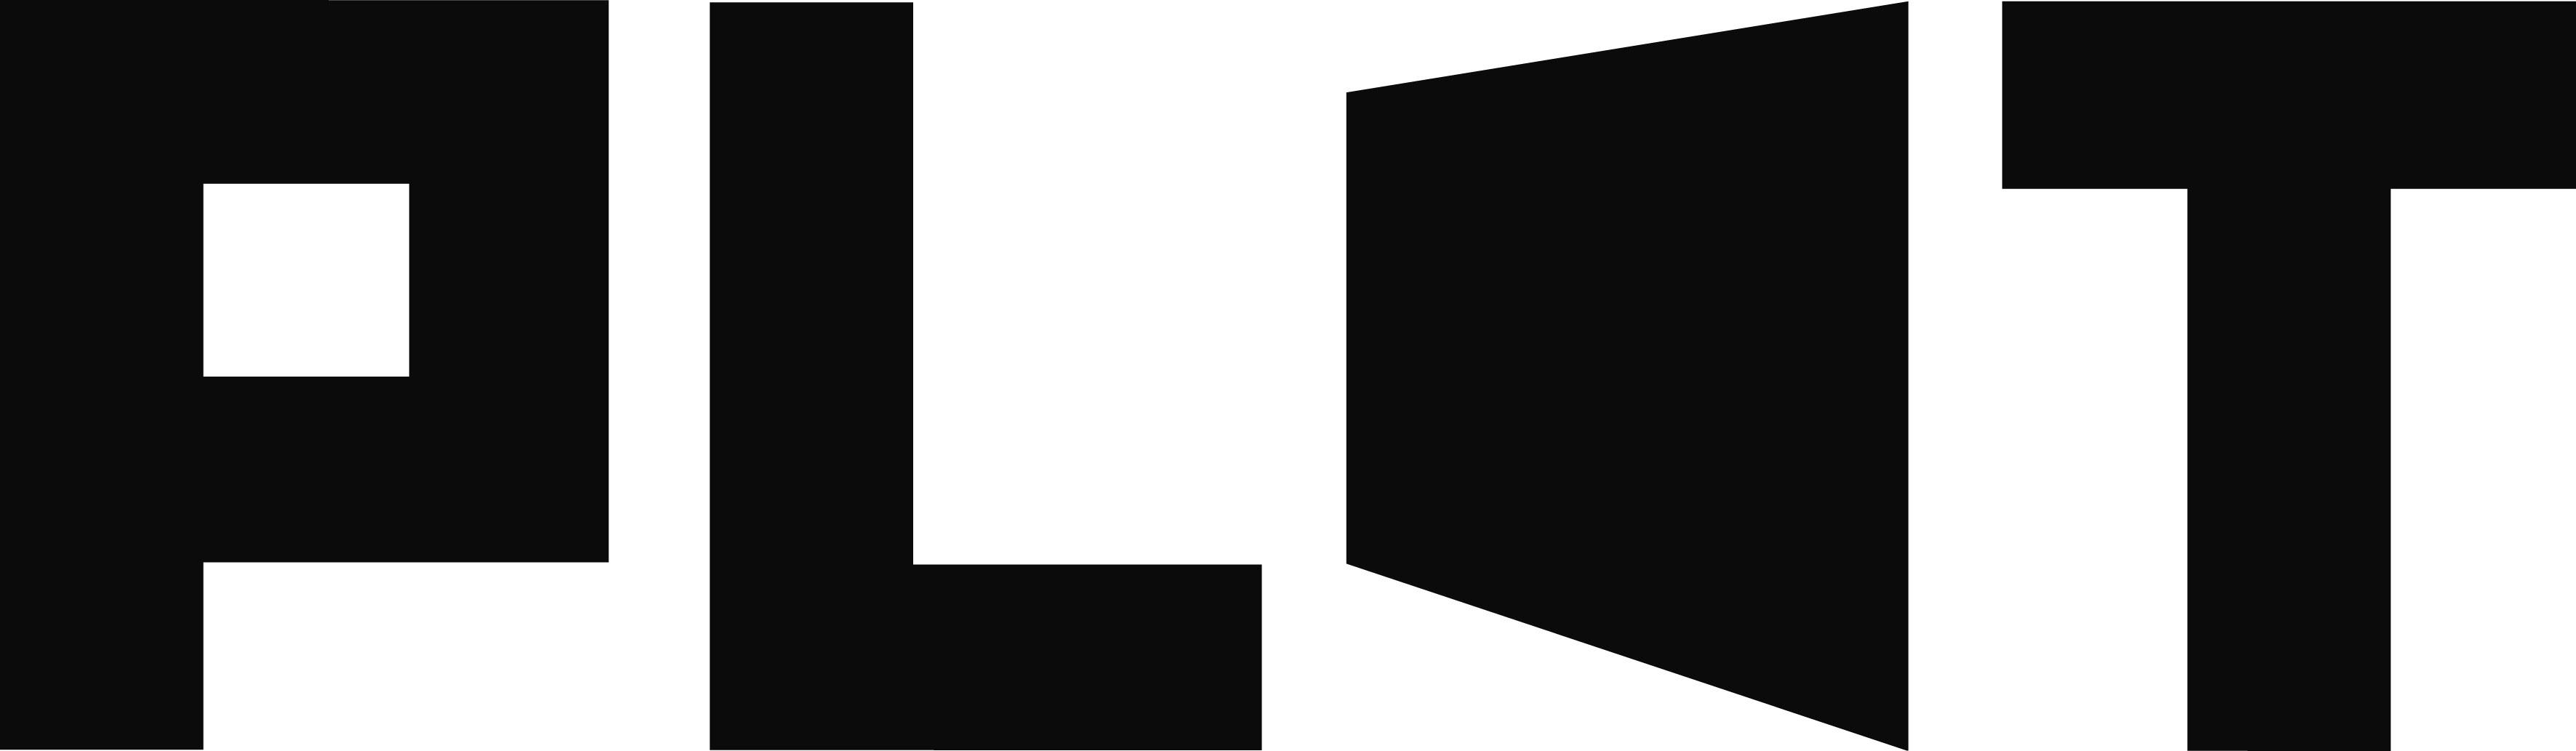 File:PLOT Magazin (logo).jpg - Wikimedia Commons